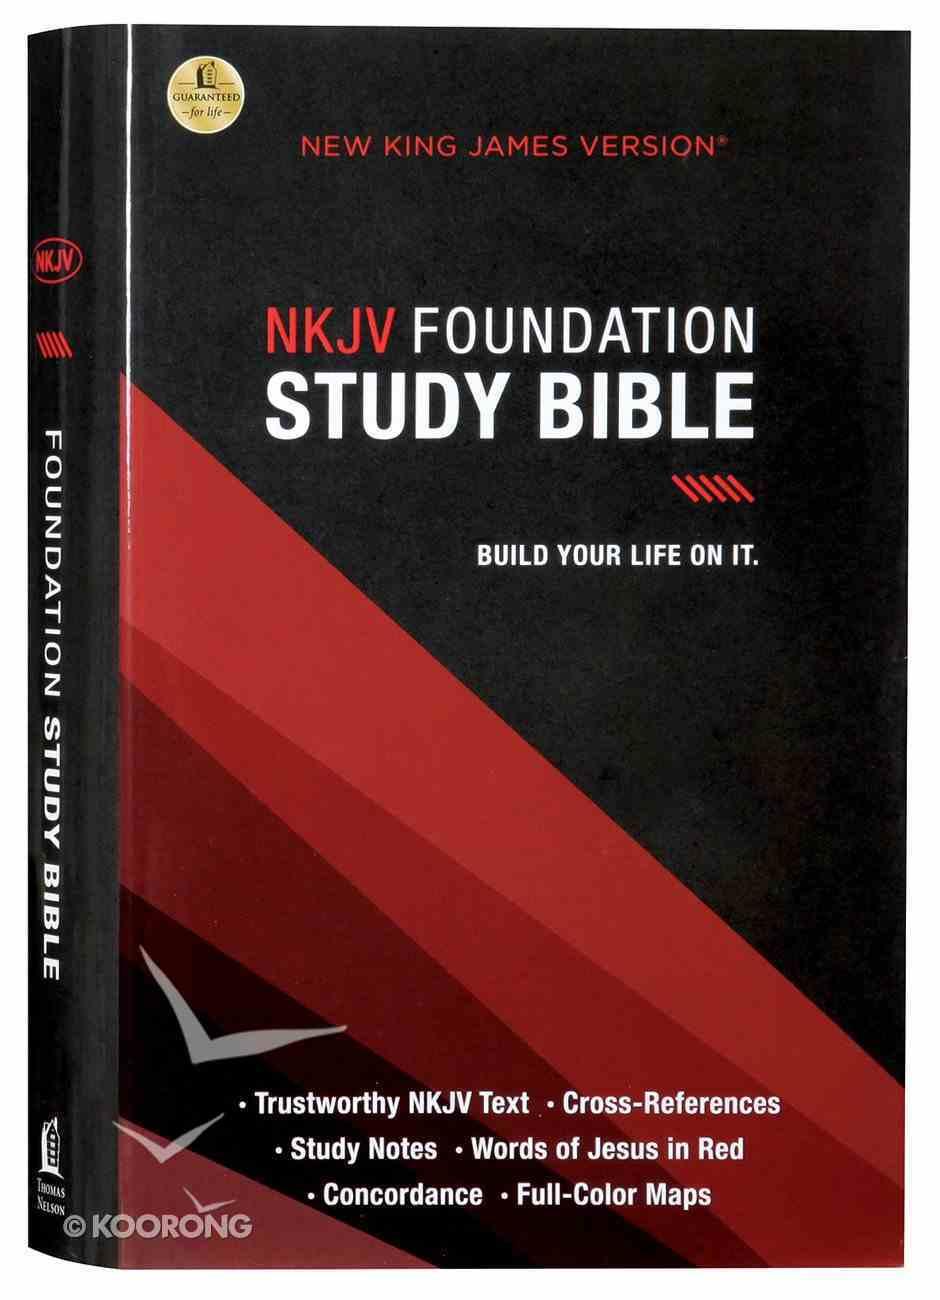 NKJV Foundation Study Bible (Red Letter Edition) Hardback